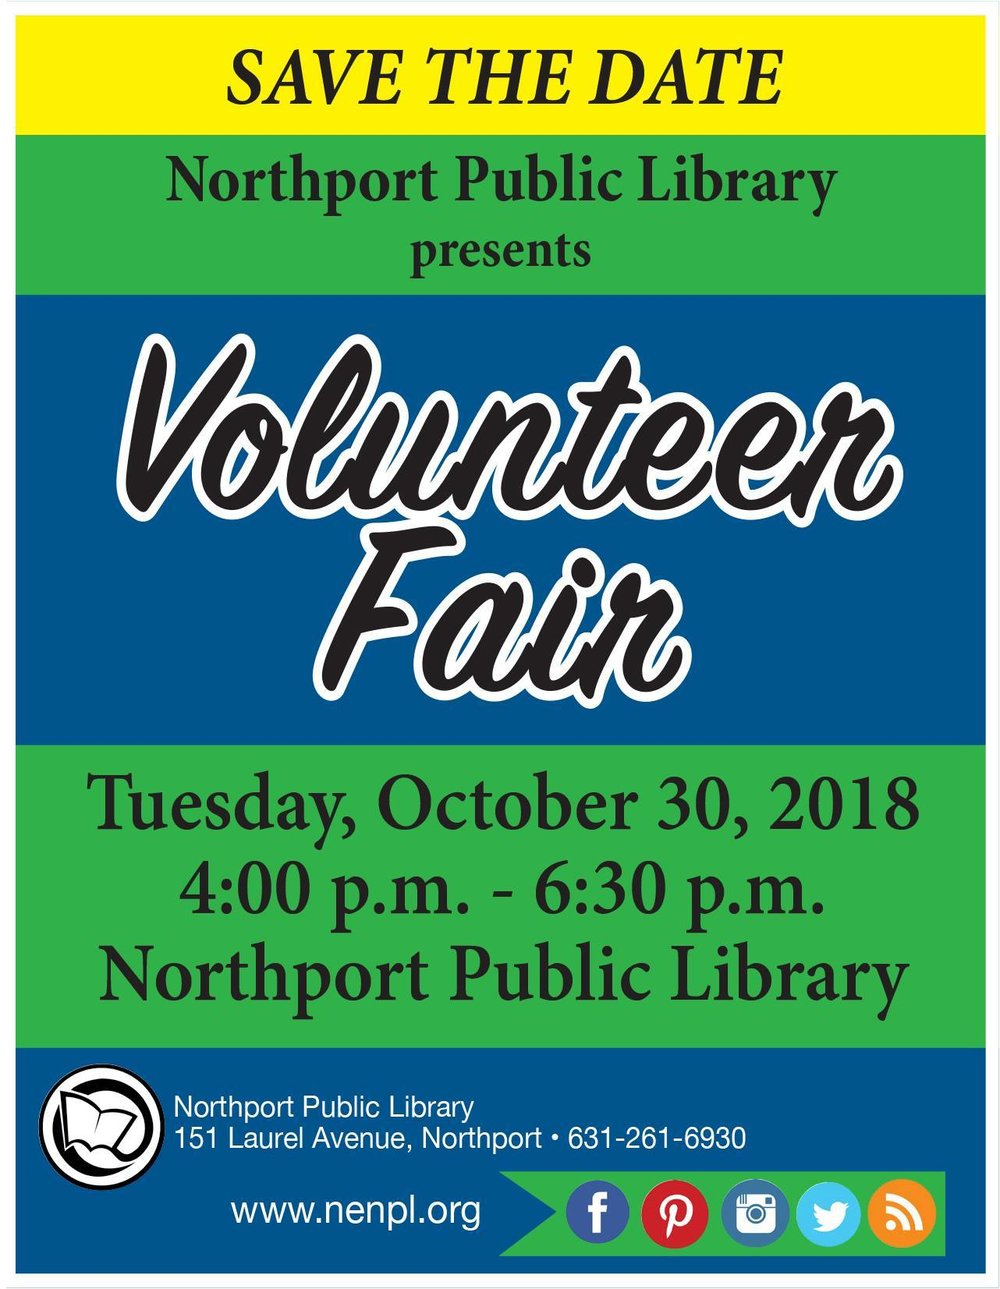 Northport-Library-Volunteer-Fair.jpg